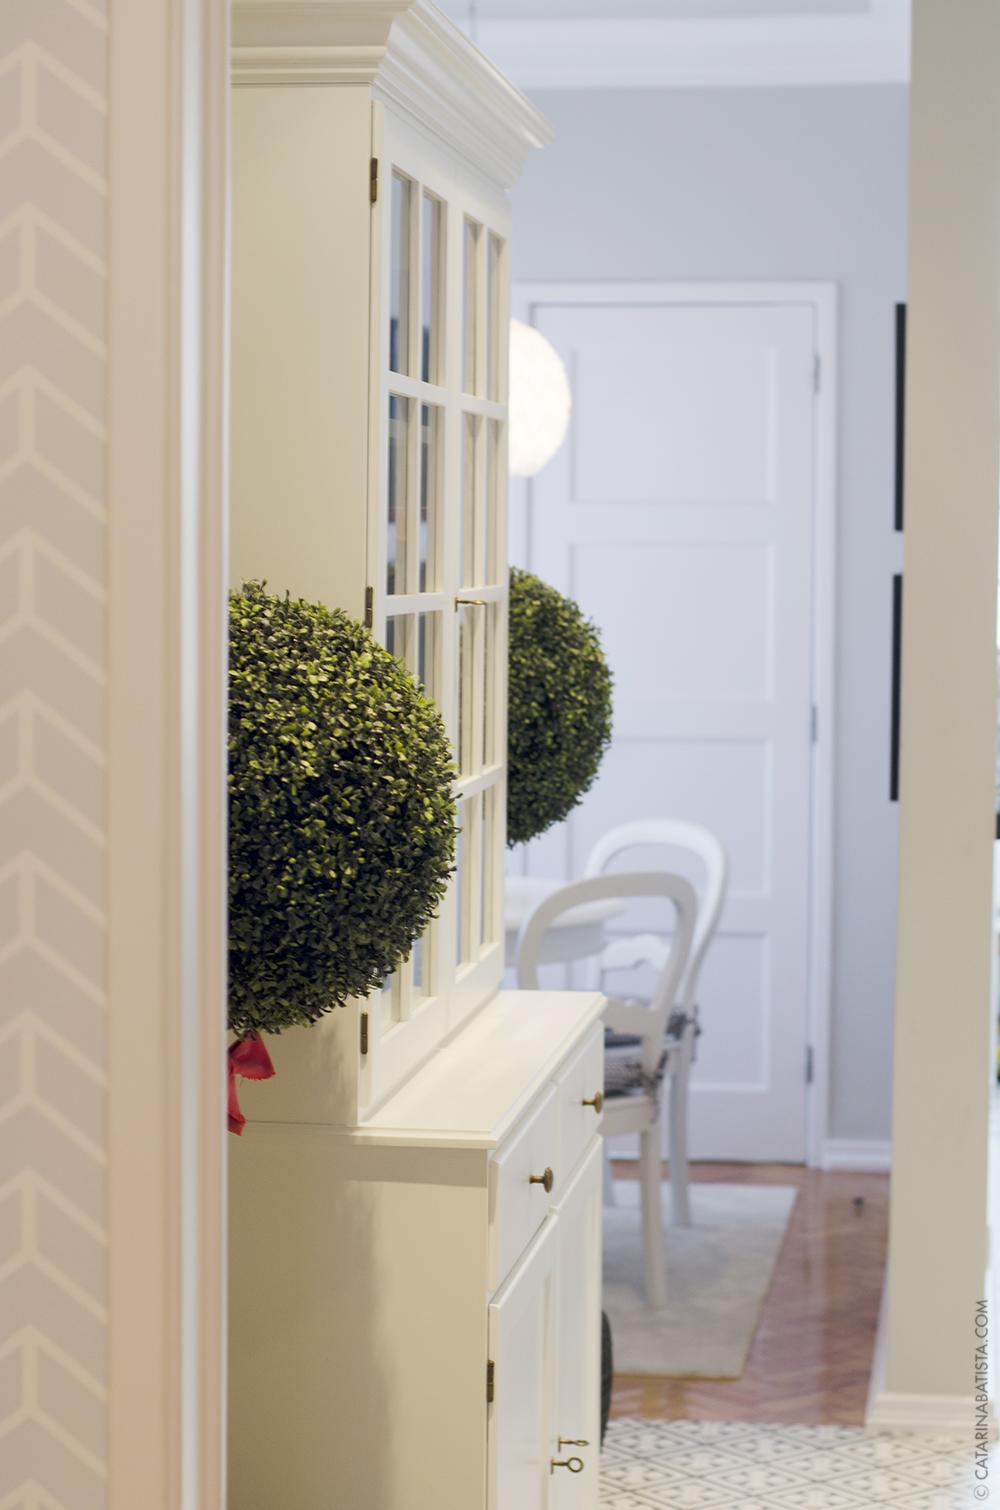 23-catarina-batista-arquitectura-design-interior-decoracao--apartamento-quarto-bedroom-livingroom-sala.jpg